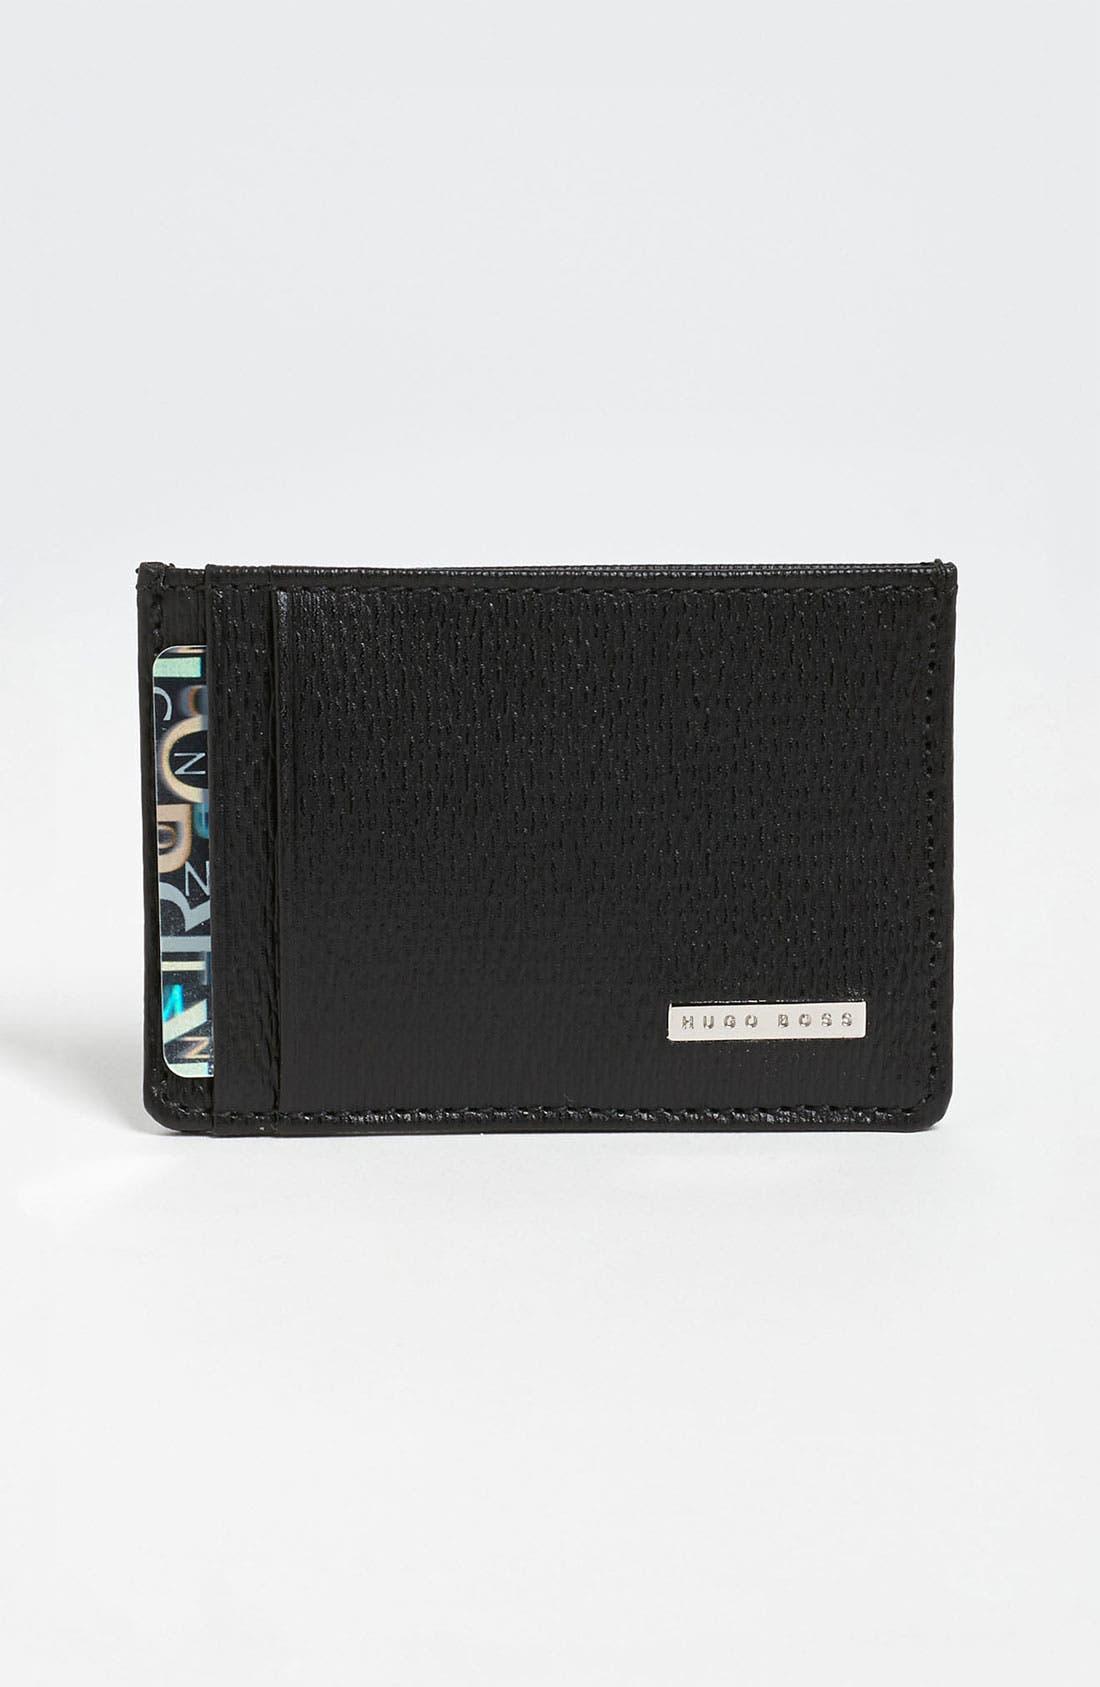 Main Image - BOSS Black 'Luber' Card Case